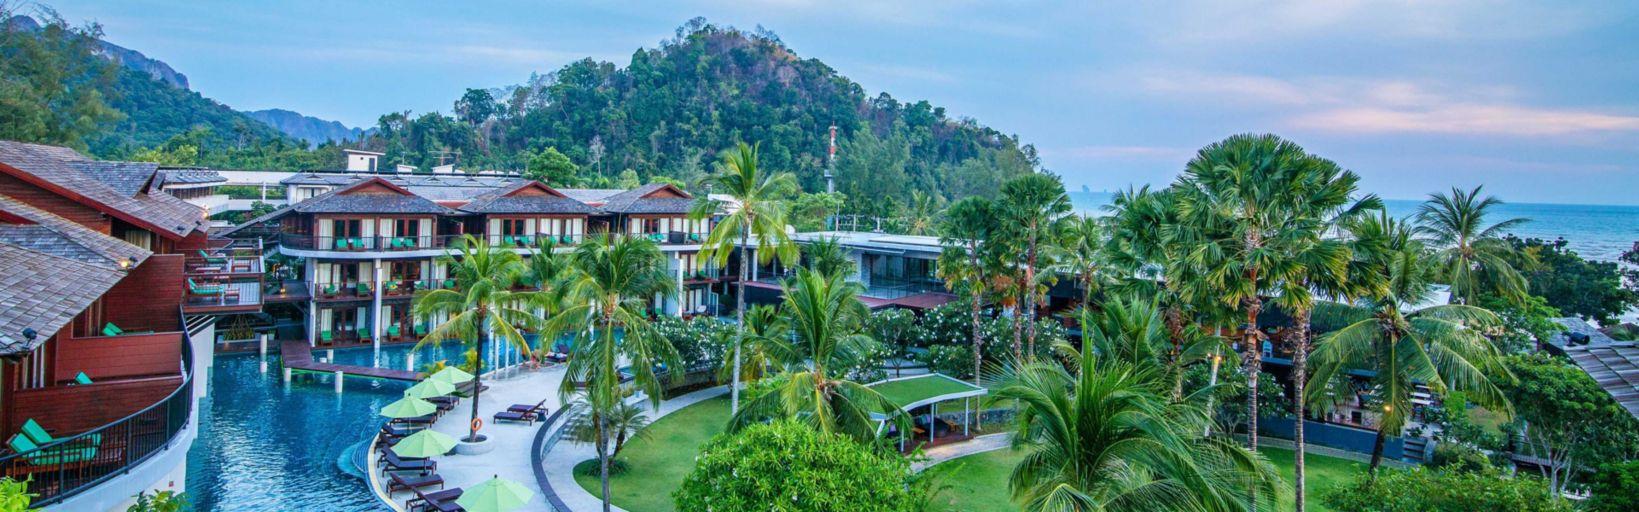 Hotel Garden Welcome To Holiday Inn Resort Krabi Ao Nang Beach